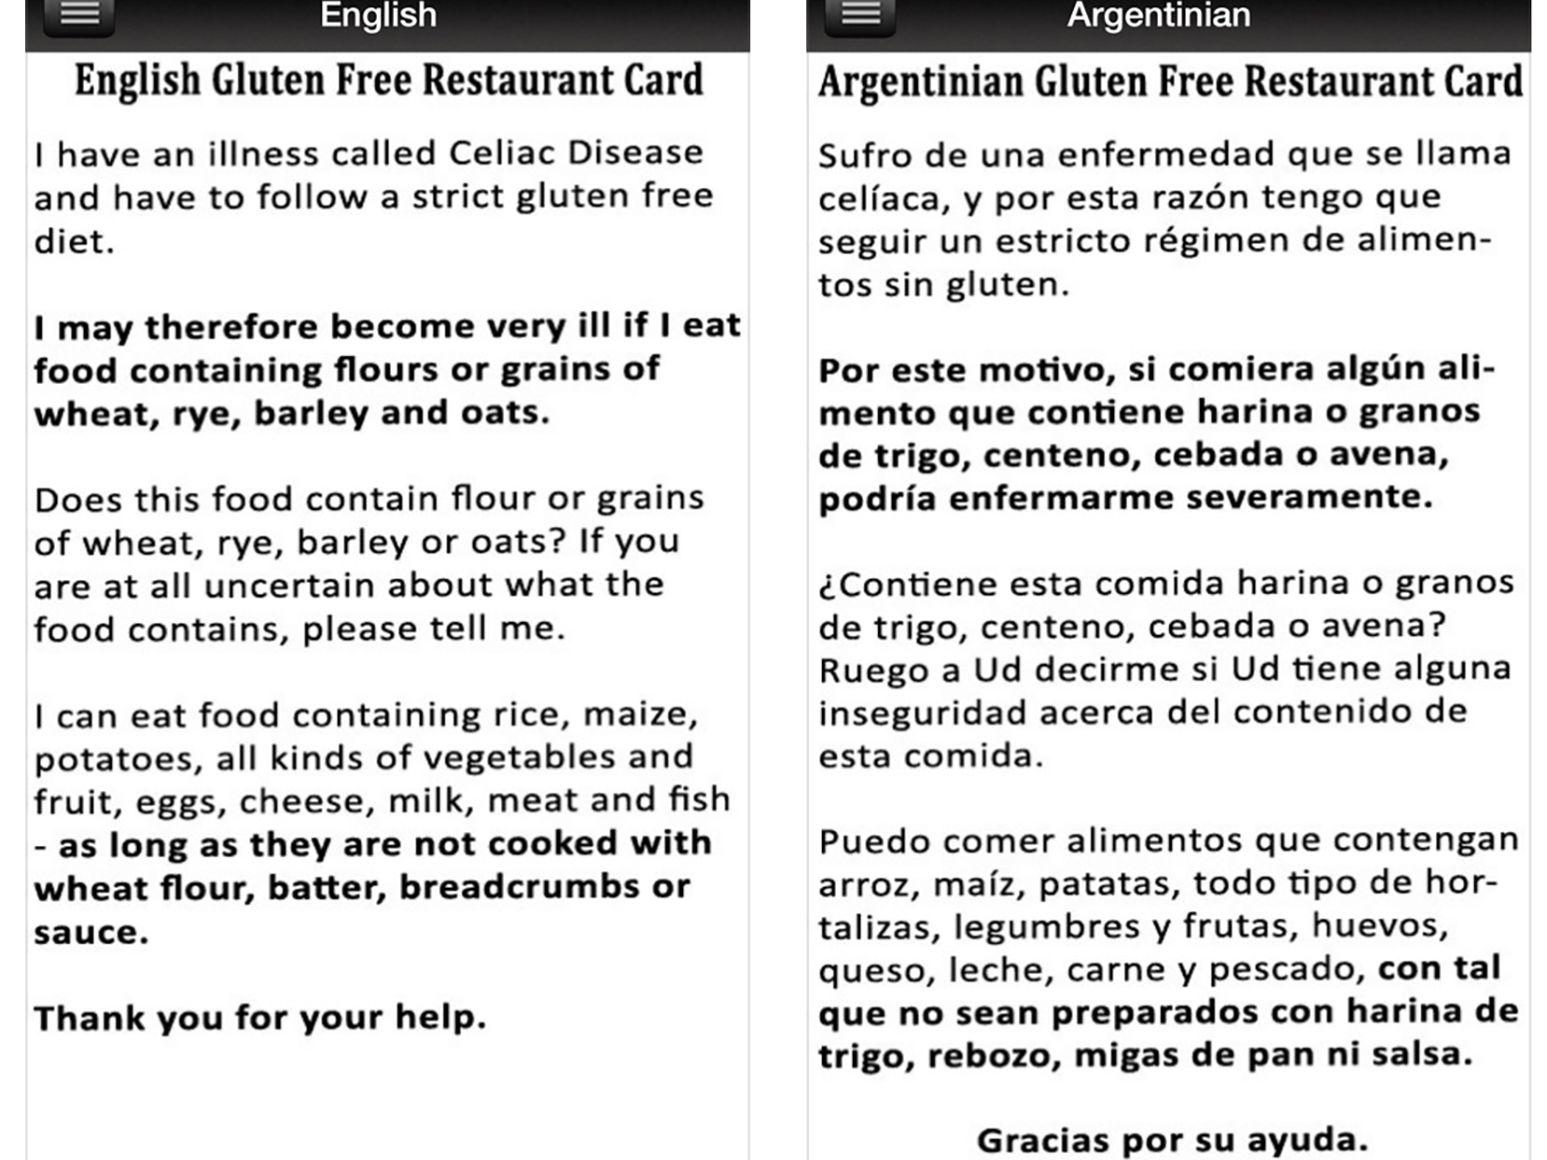 6 Sources Of Gluten Free Restaurant Cards